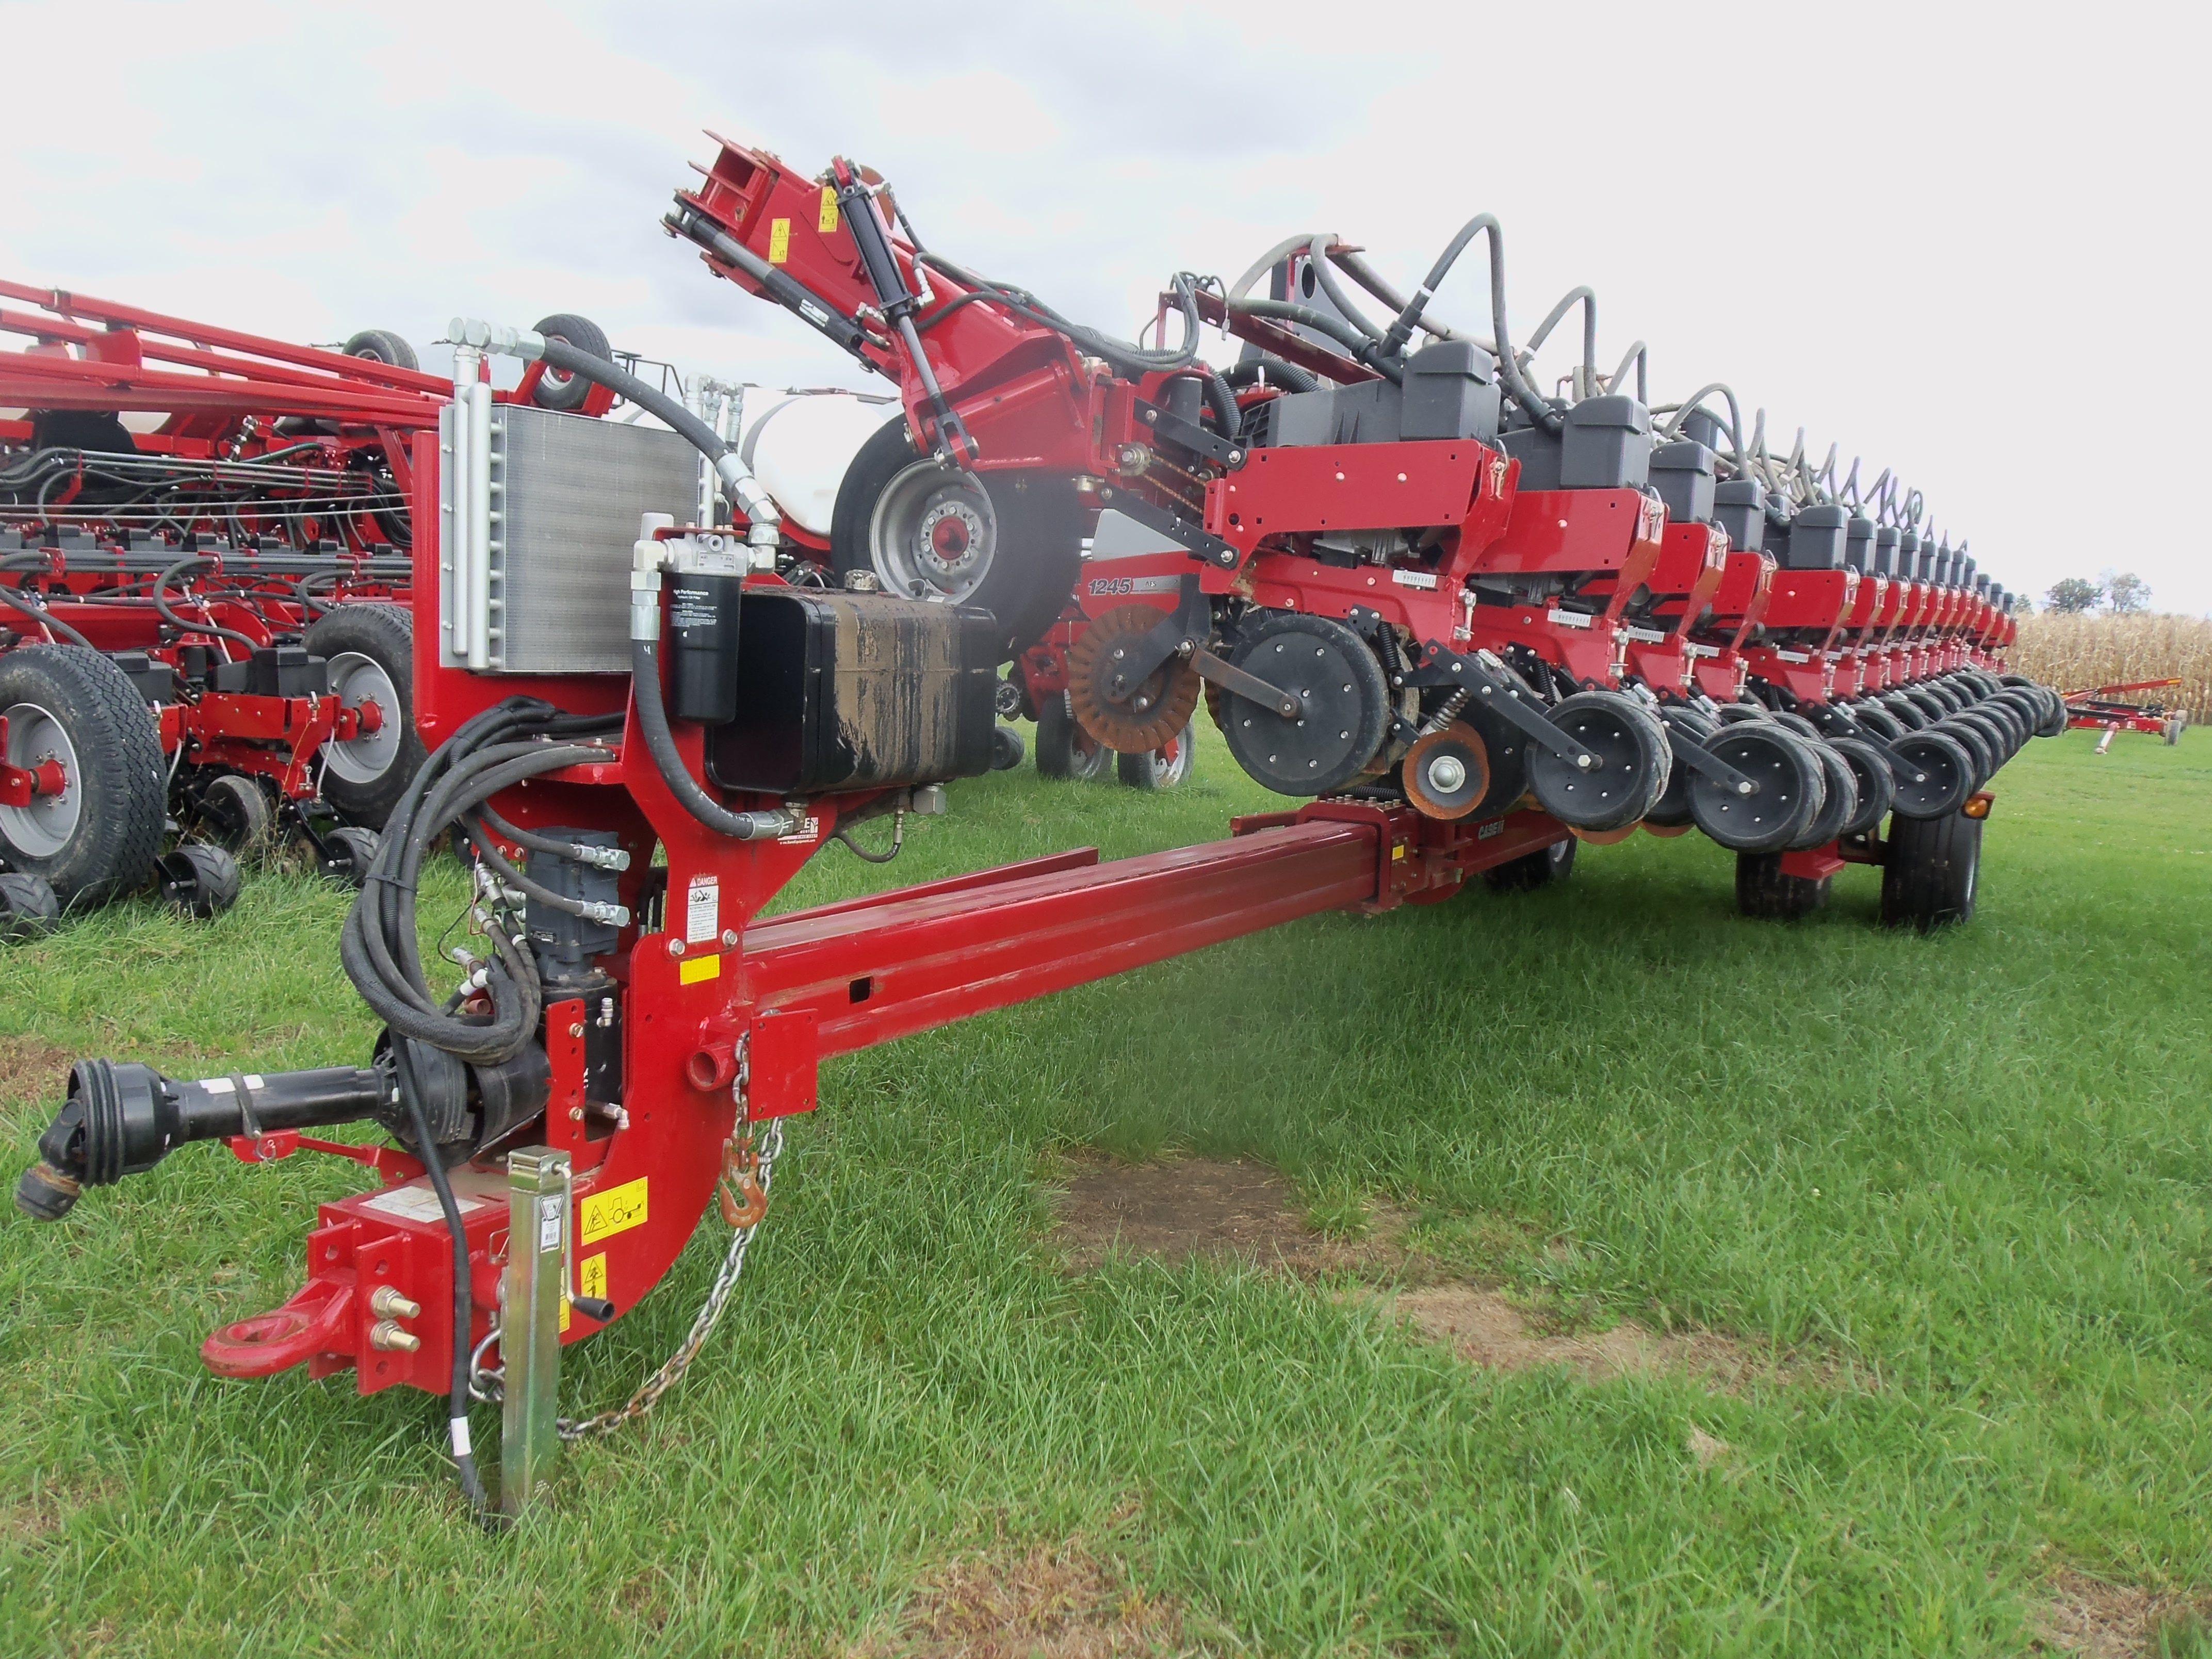 31 Row Caseih 1245 Corn Planter Caseih Equipment Planters The Row